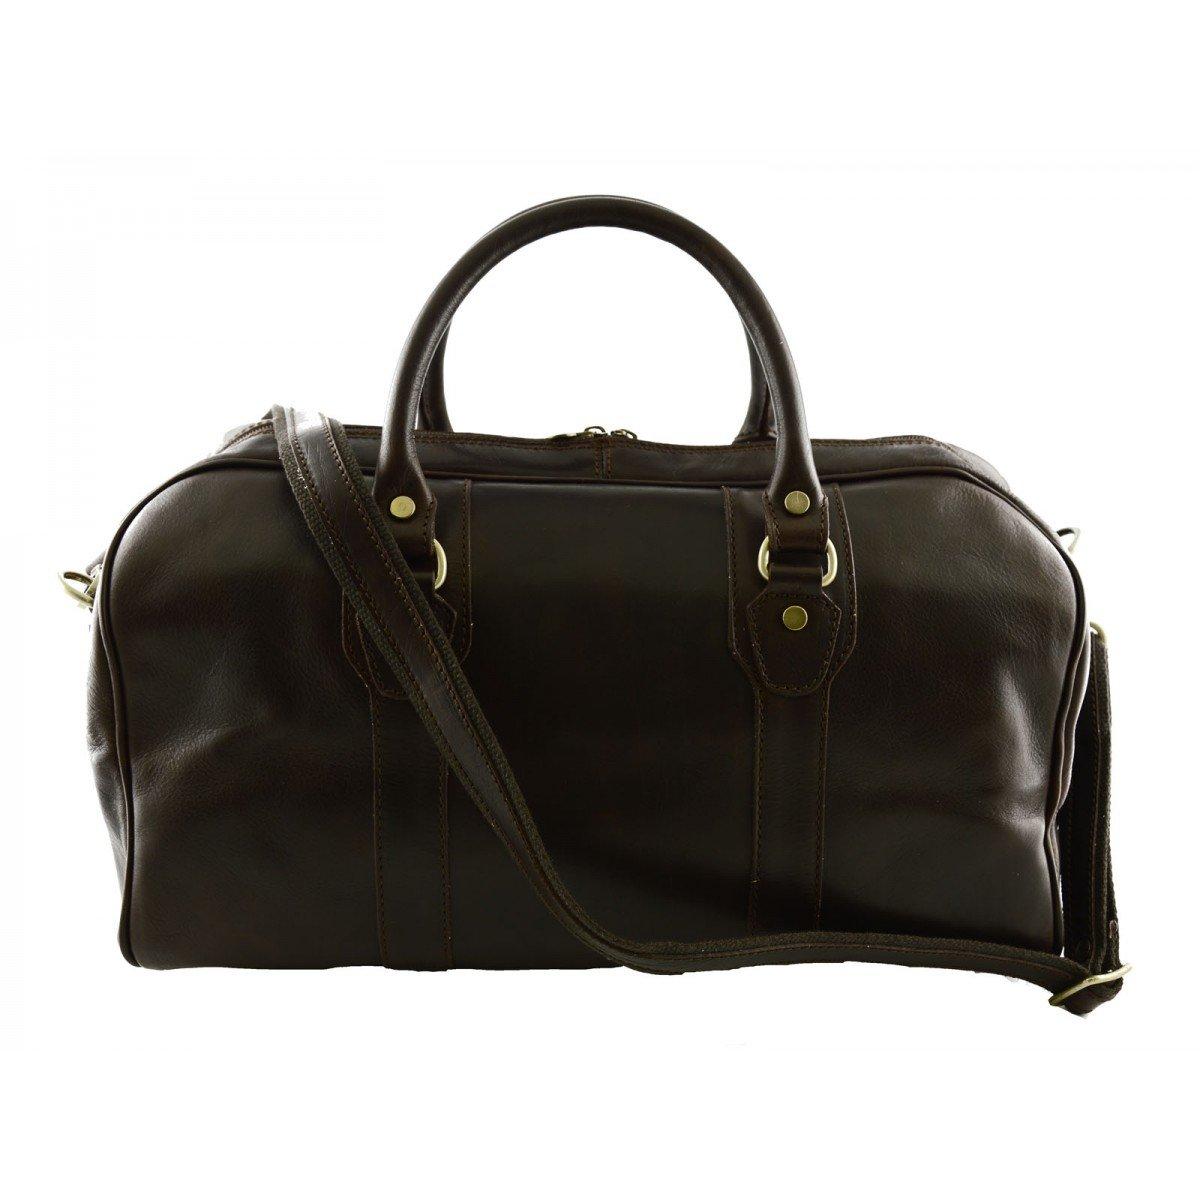 Made In Italy Genuine Leather Travel Bag Color Dark Brown - Travel Bag B01N7ZA45B